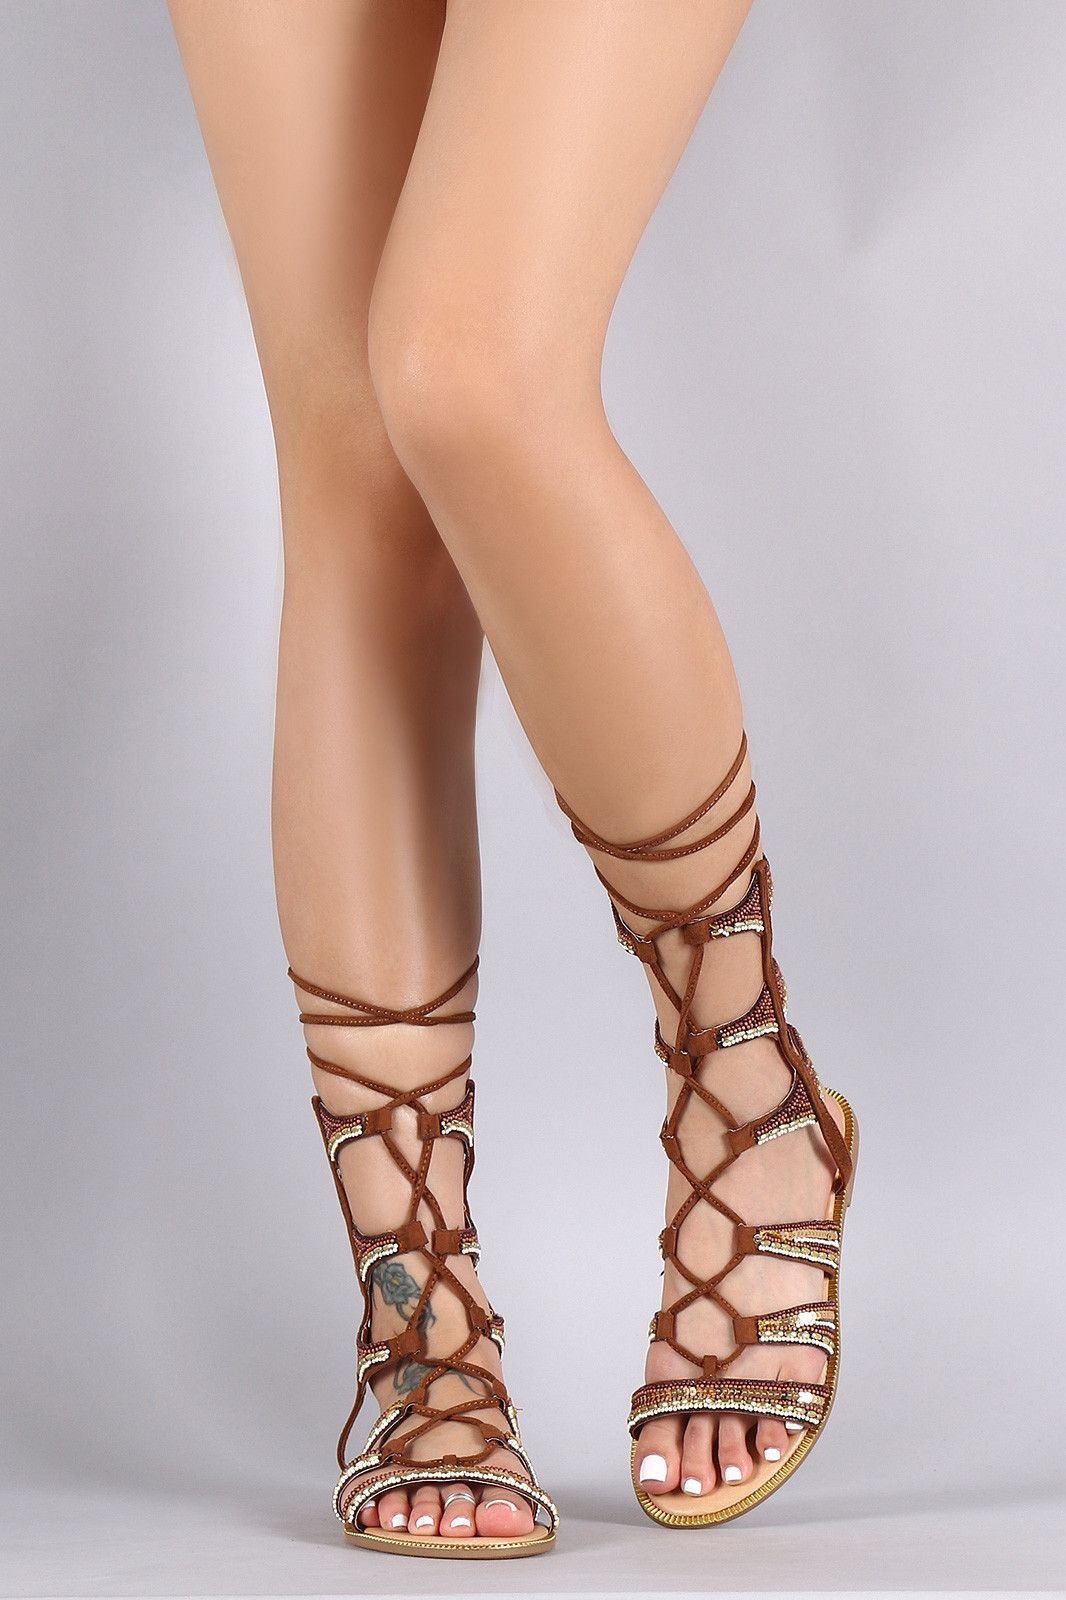 912aa3d5262 Beaded Lace Up Flat Gladiator Sandal